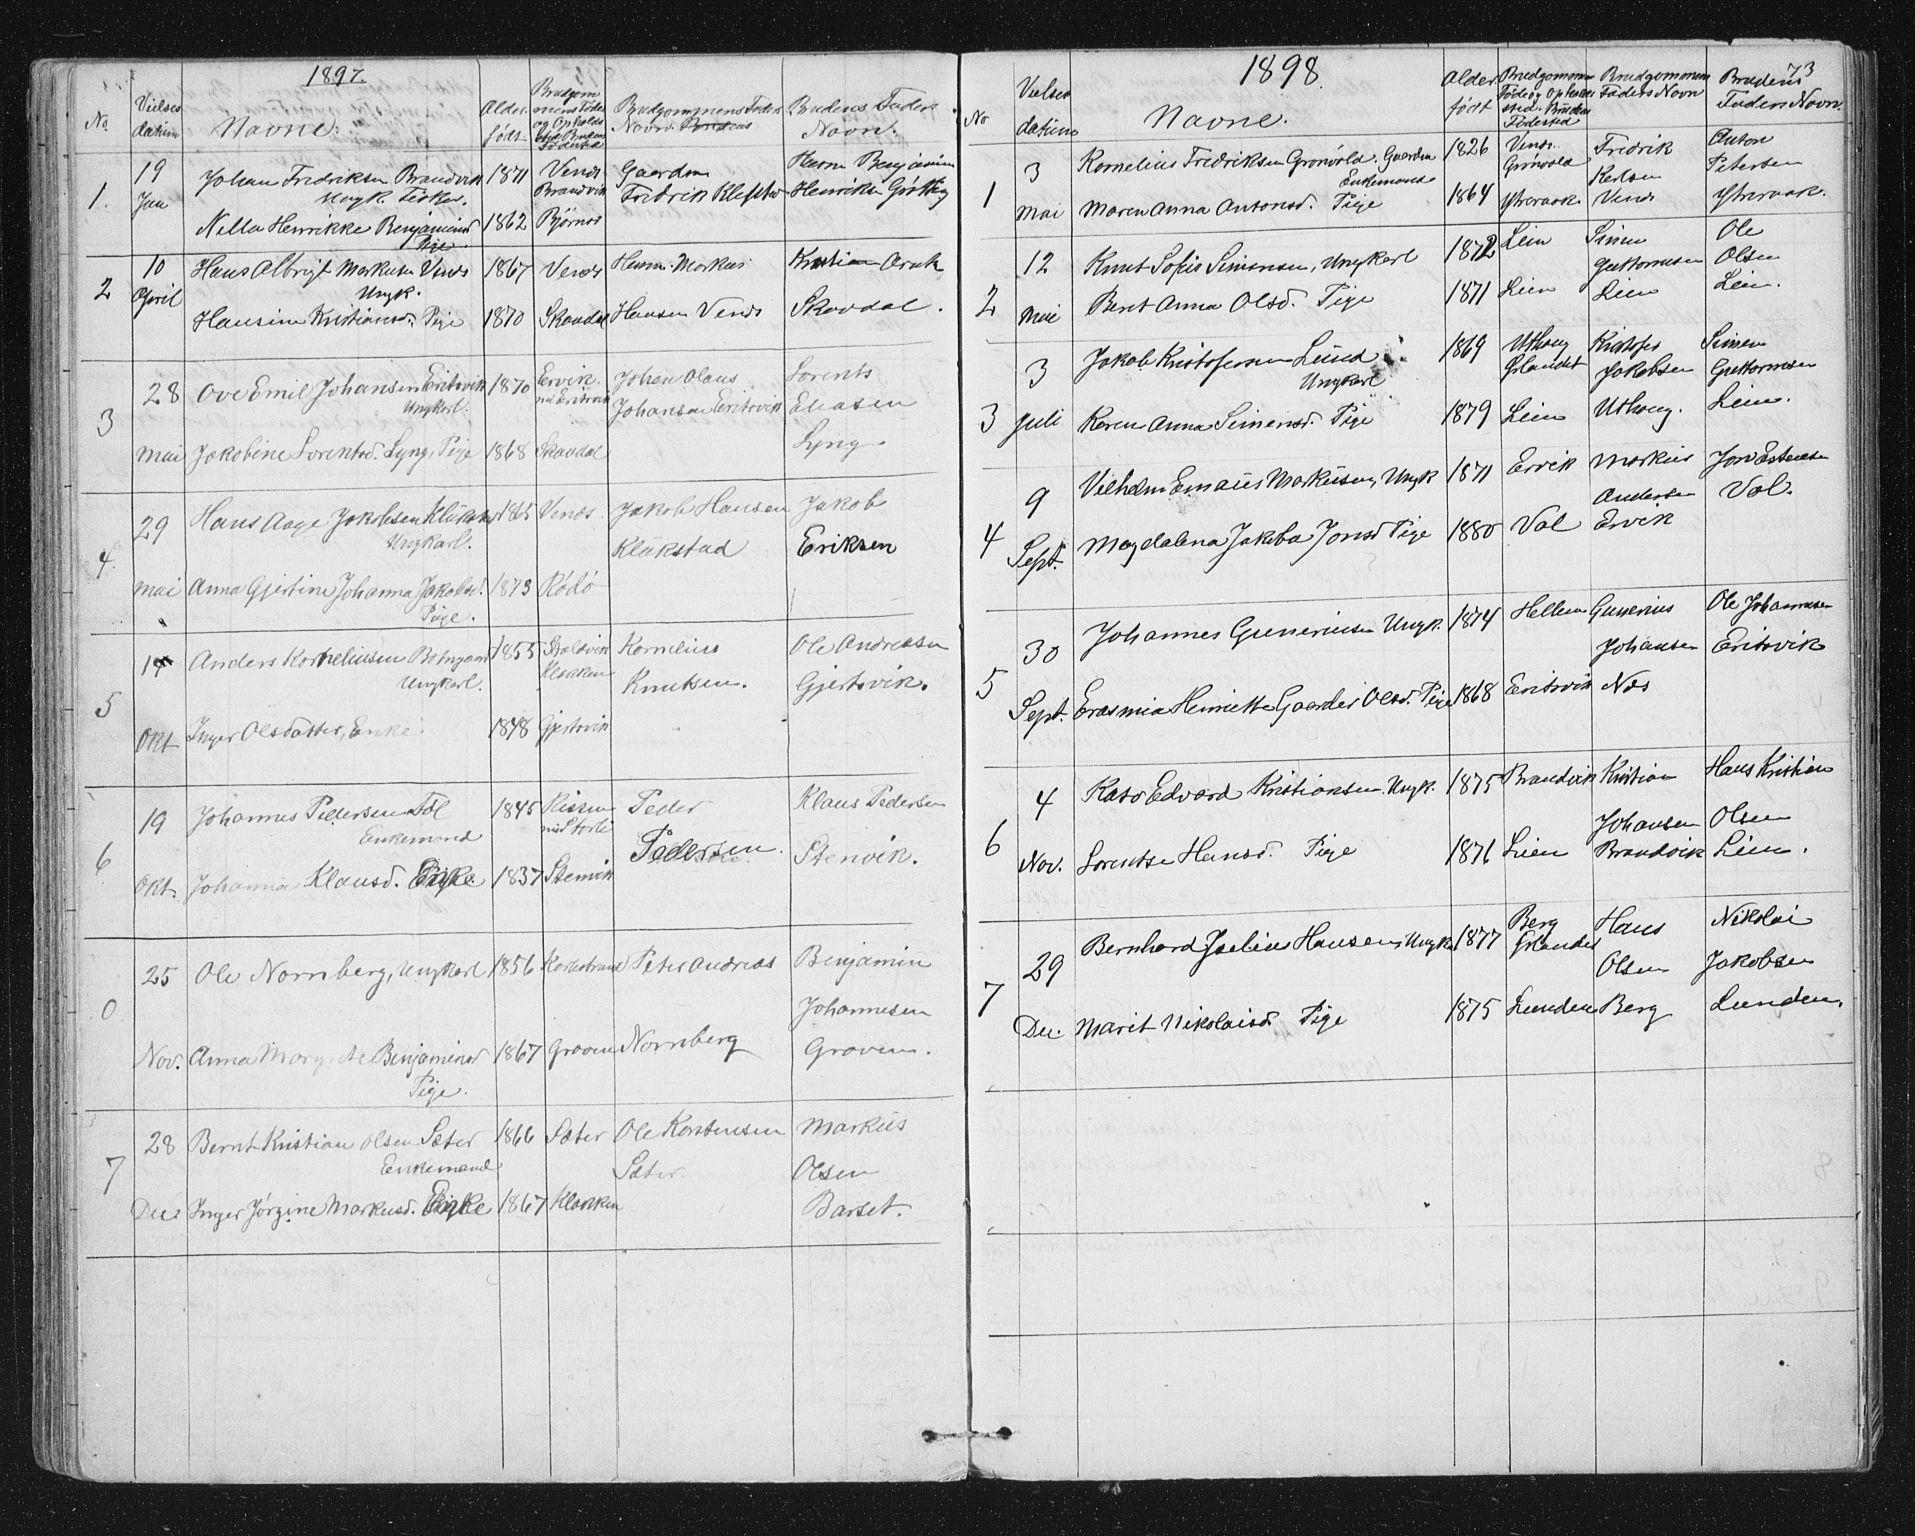 SAT, Ministerialprotokoller, klokkerbøker og fødselsregistre - Sør-Trøndelag, 651/L0647: Parish register (copy) no. 651C01, 1866-1914, p. 73